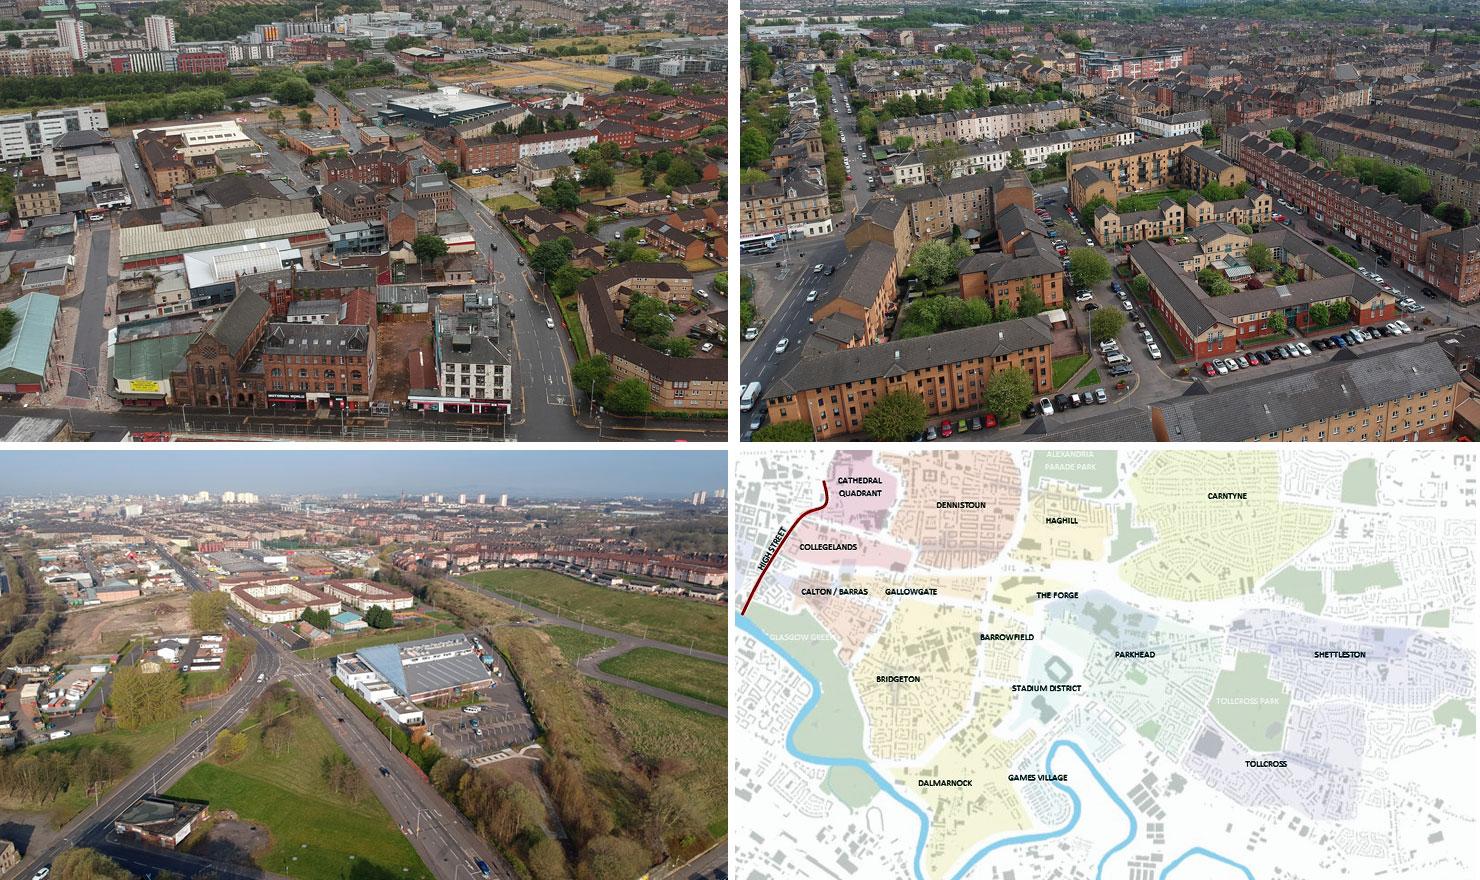 CONSULTATION Starts On Development Vision For Glasgow East End Neighbourhoods